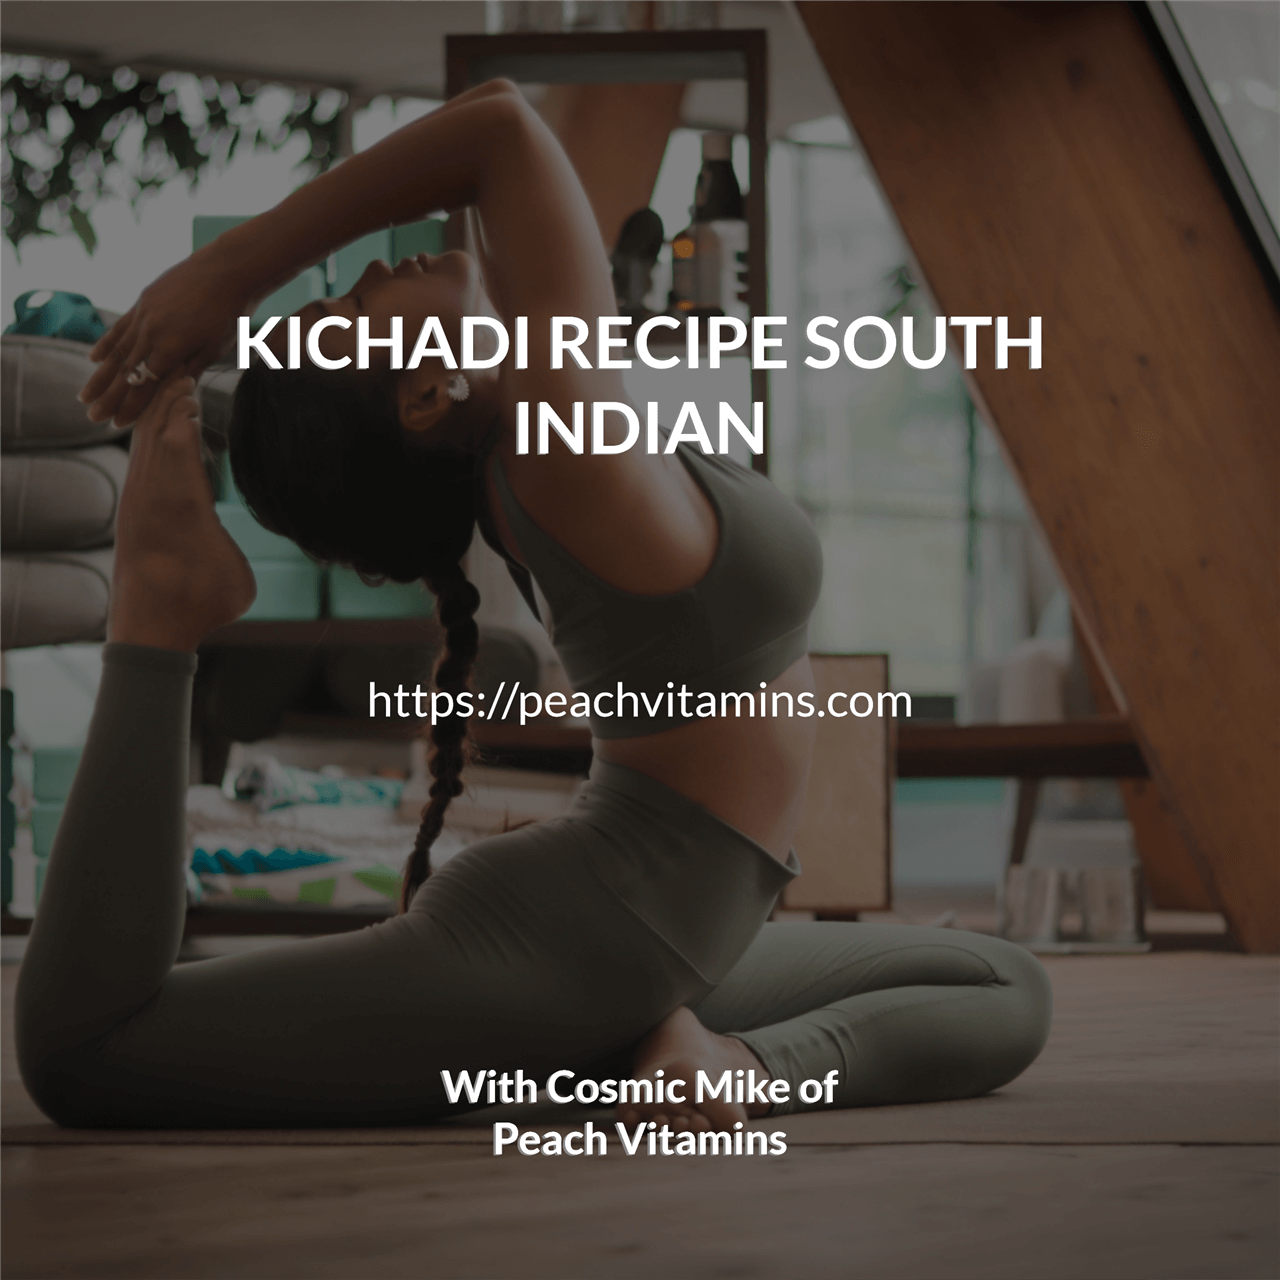 Kichadi Recipe South Indian – Dal Khichdi/Masala Khichdi/Easy And Absolutely Tasty Khichdi Recipe In 2020